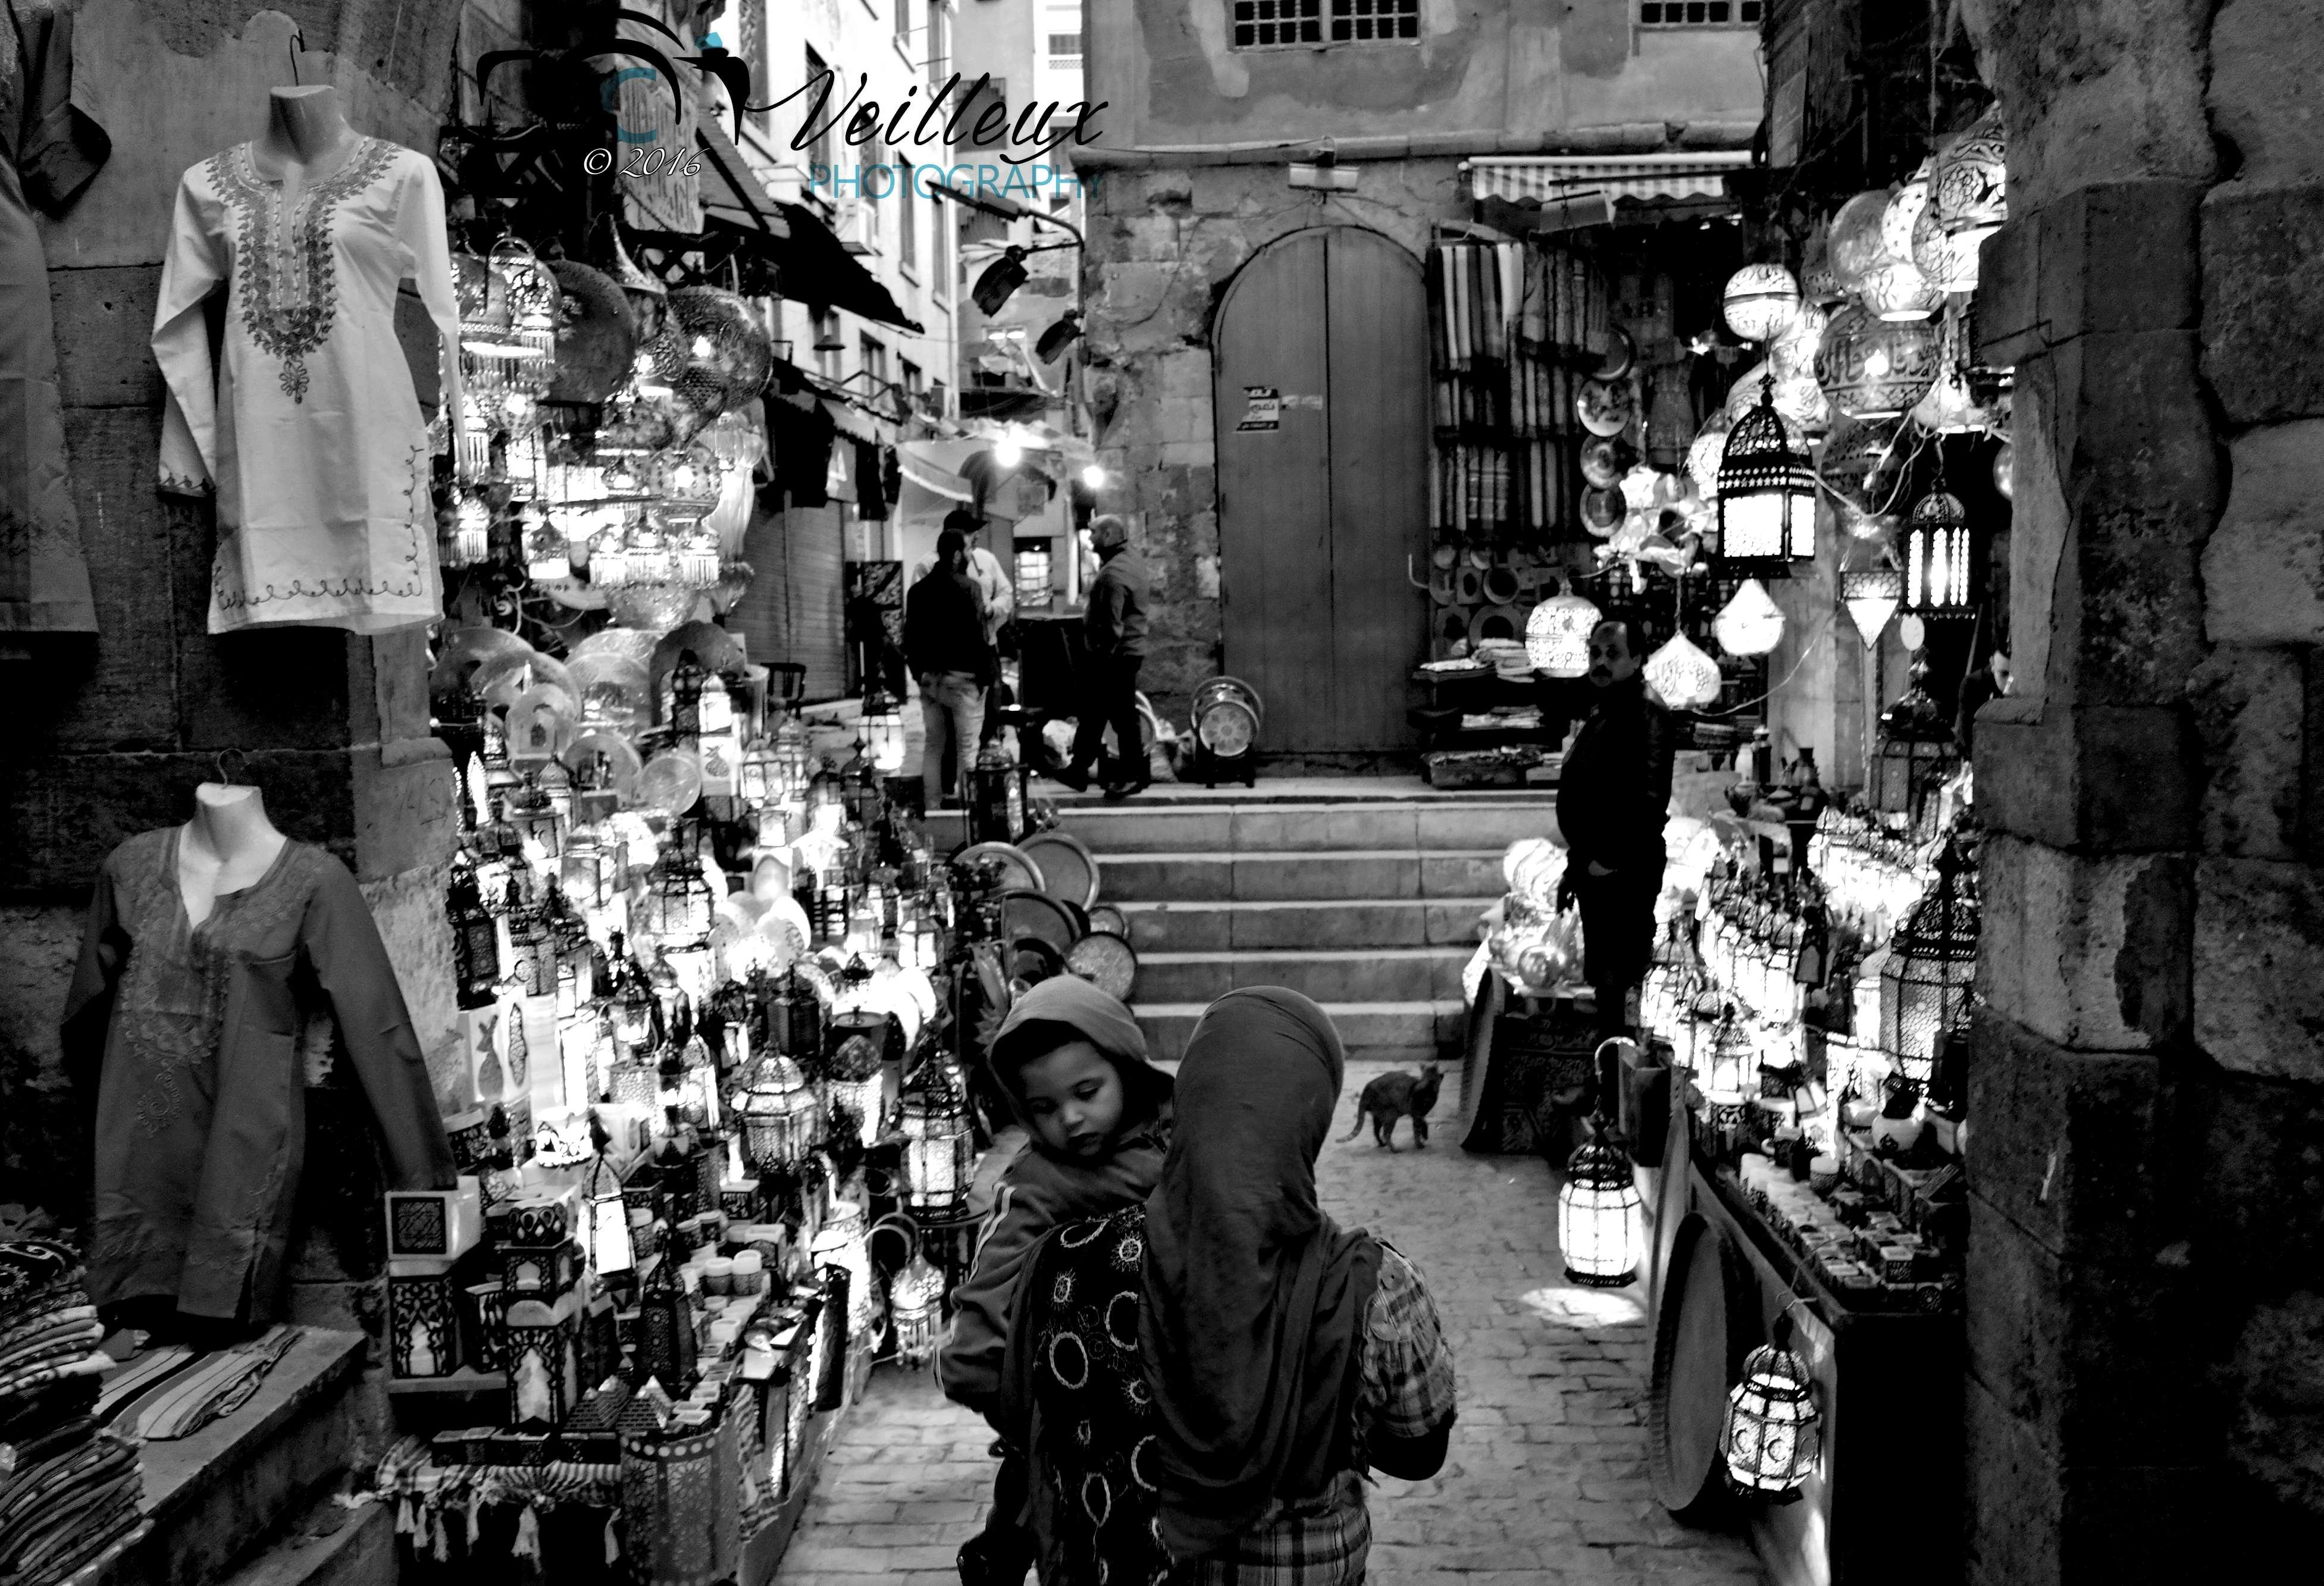 Cairo Market at Night